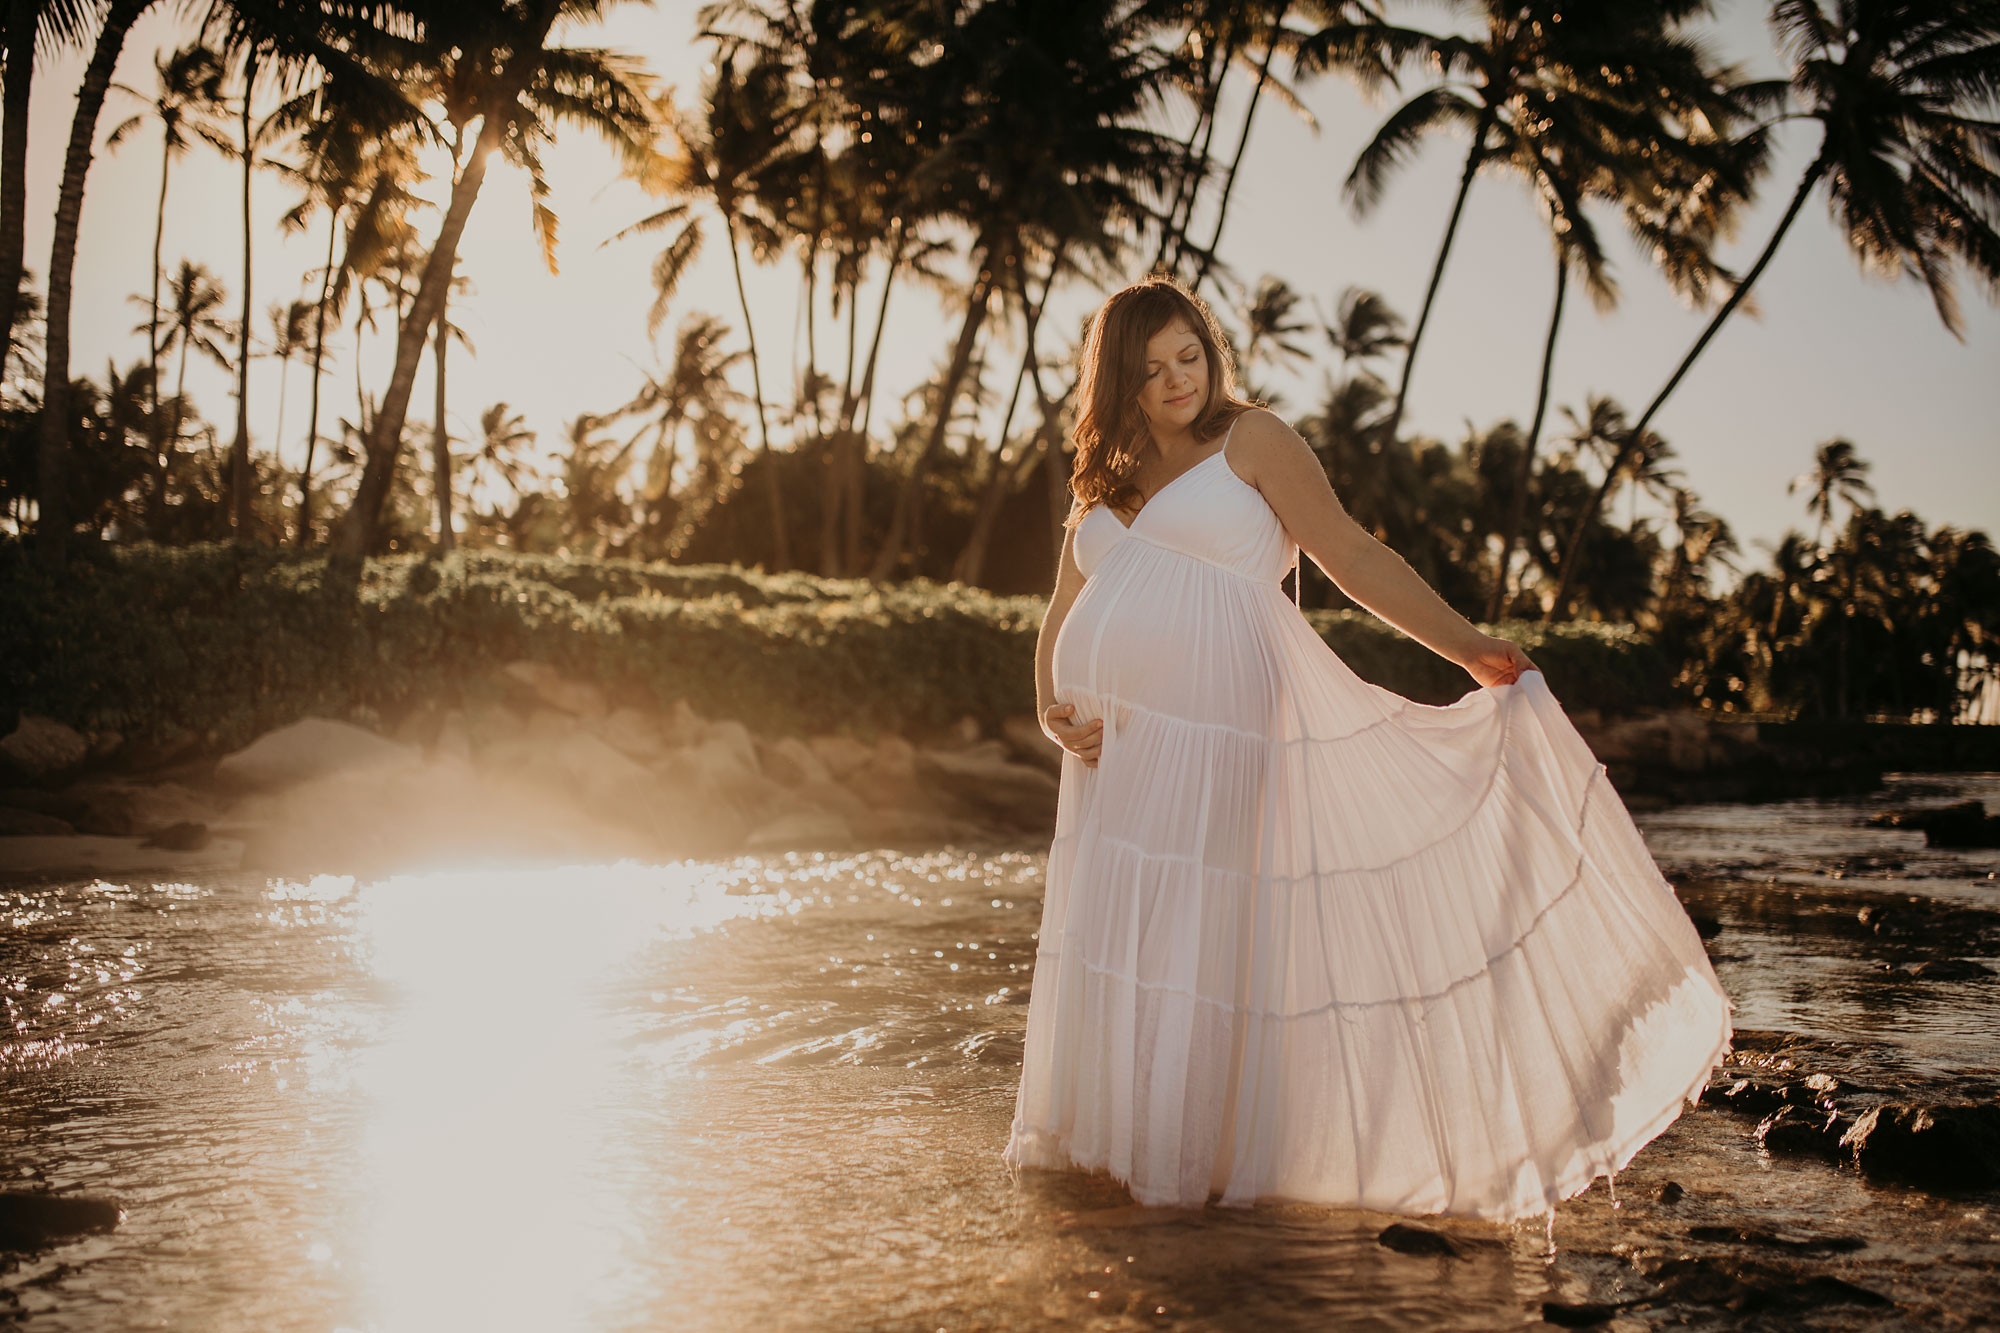 oahu-maternity-photographer-28.jpg